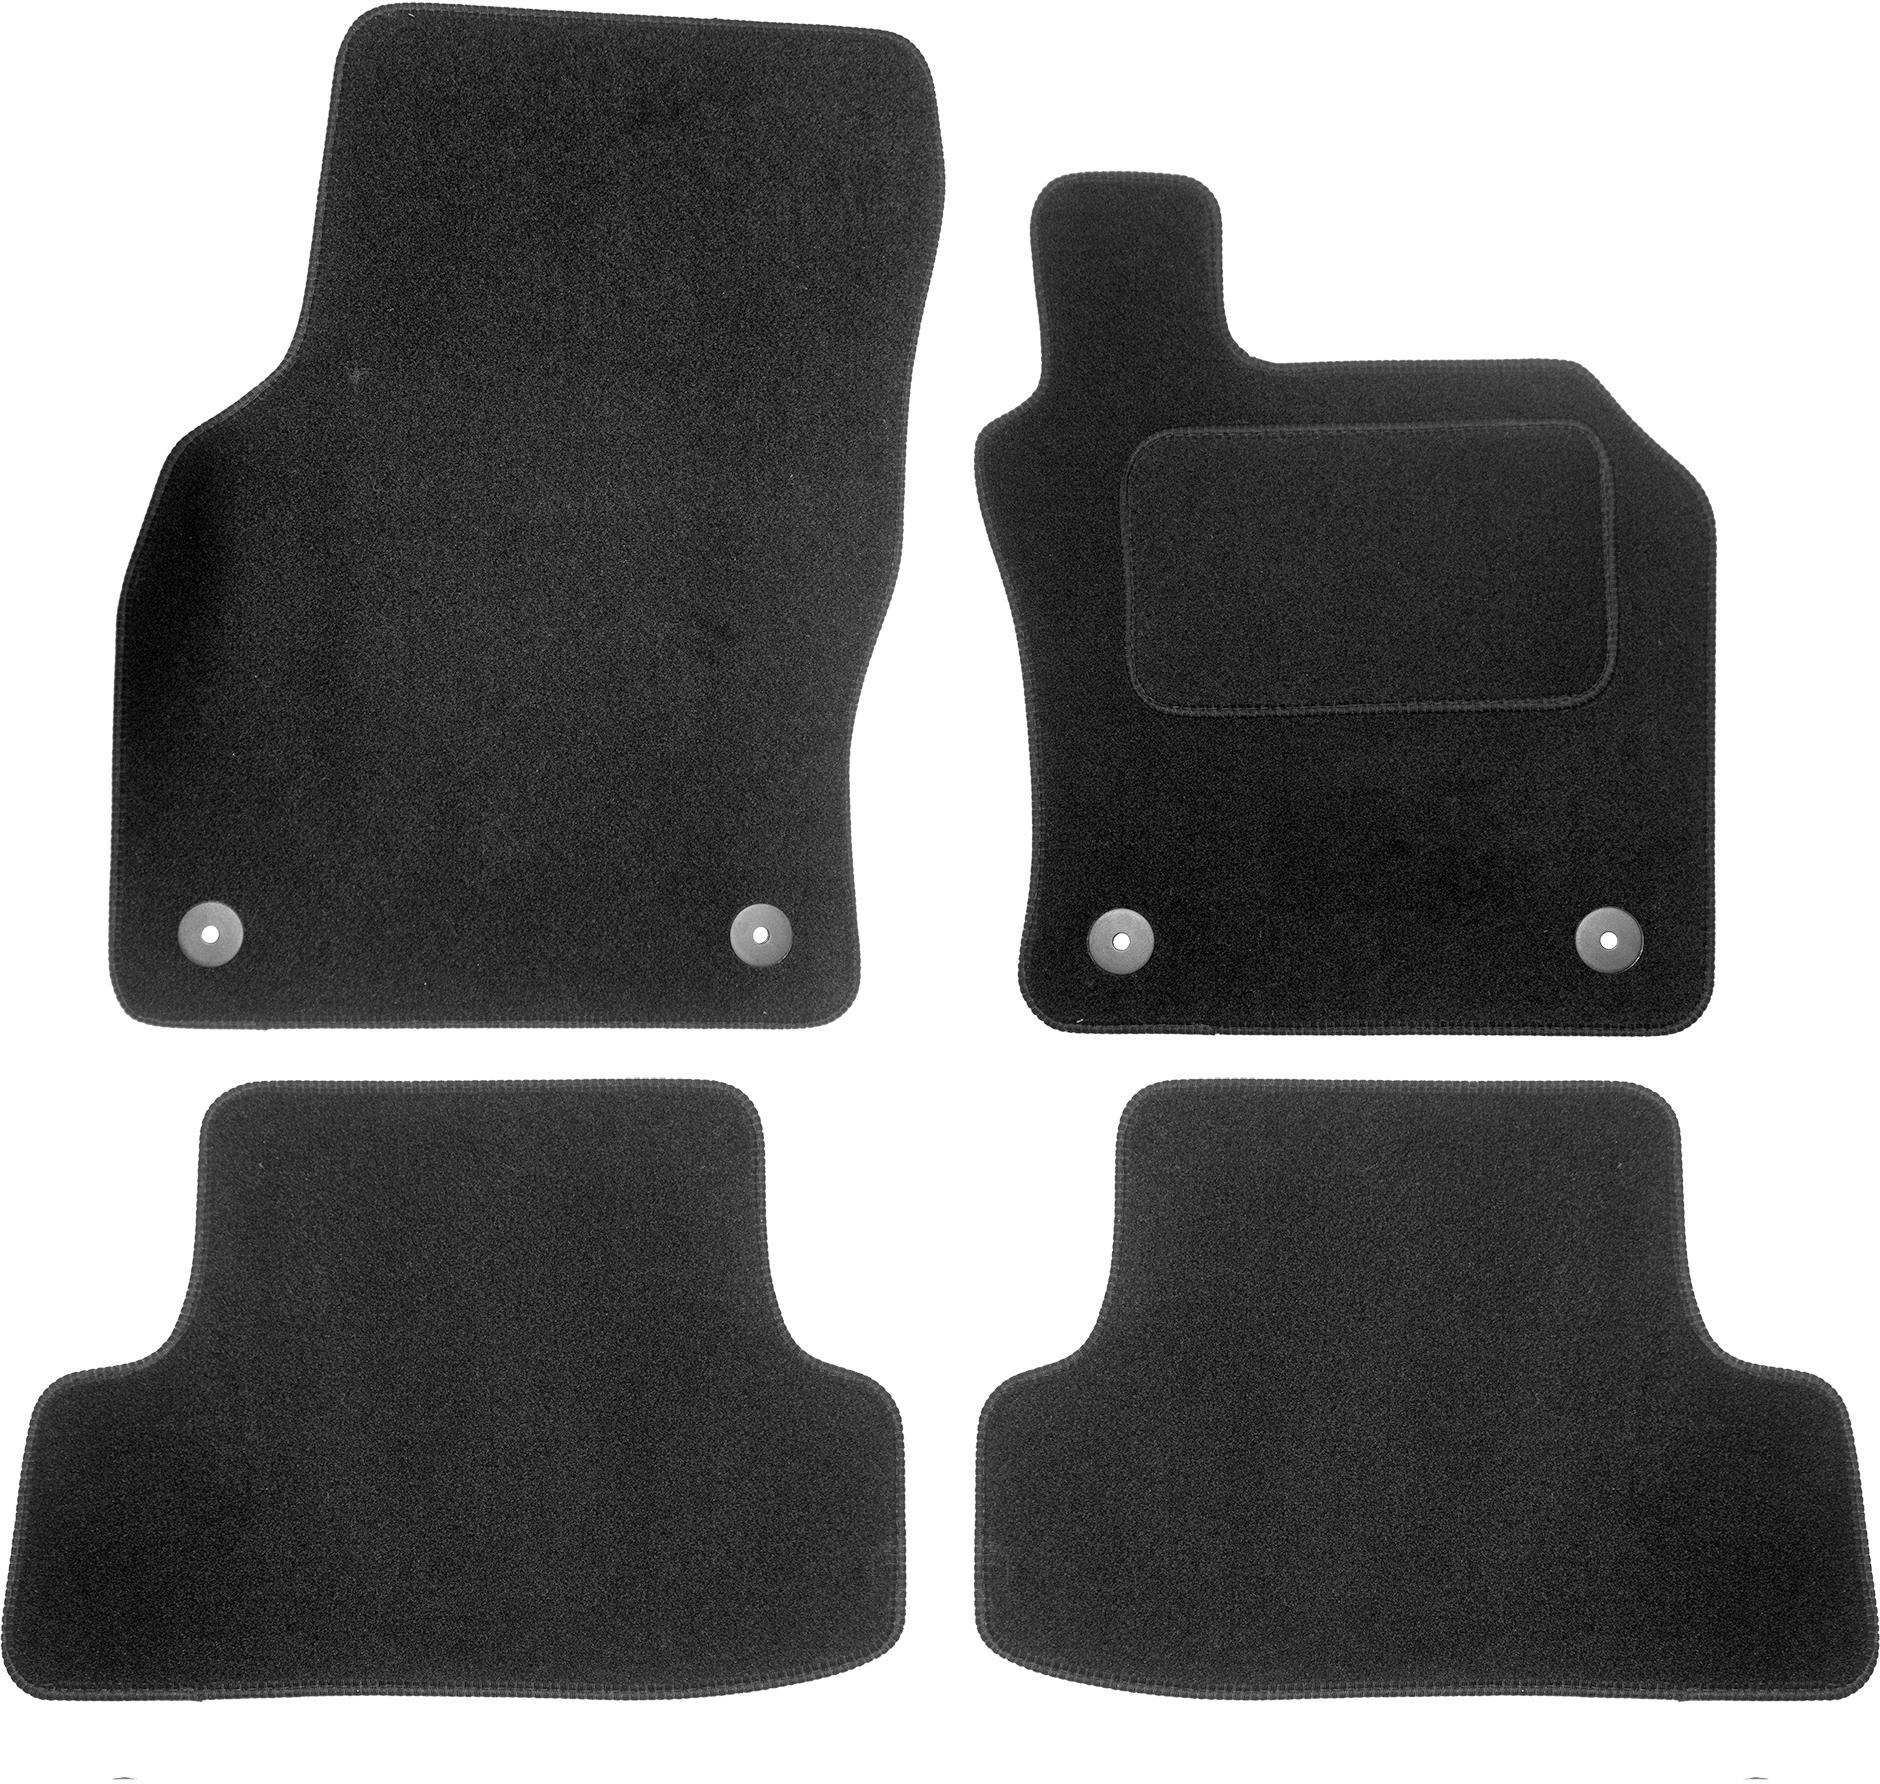 VAUXHALL INSIGNIA 2013 ON TAILORED CAR FLOOR MATS CARPET BLACK MAT BLACK TRIM